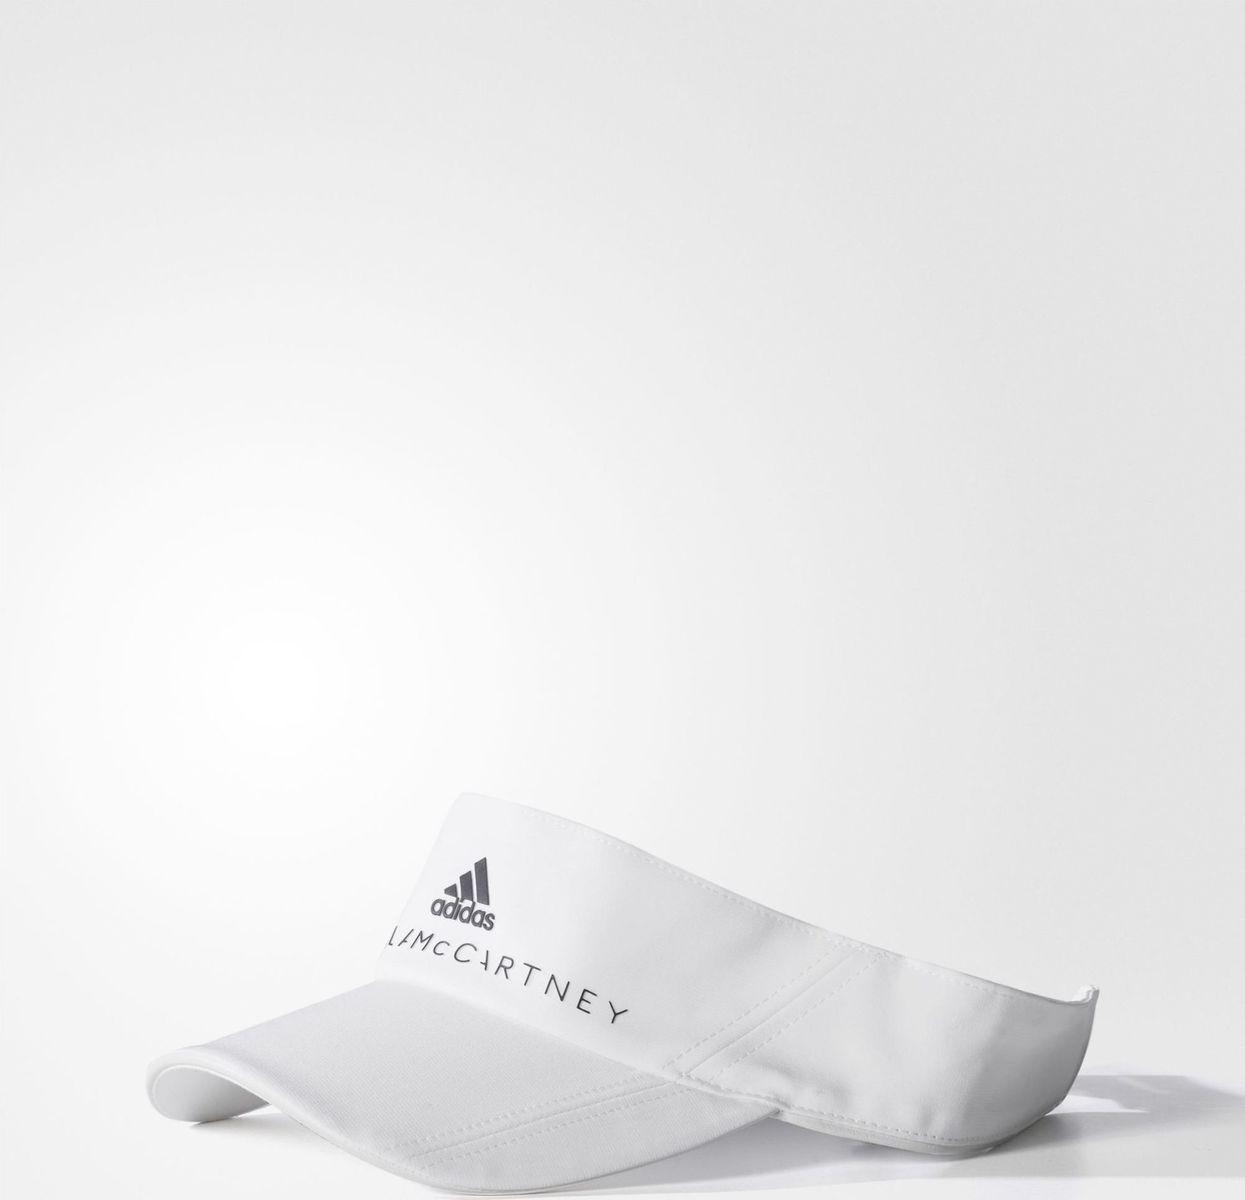 Adidas Visiera Stella McCartney Bianca